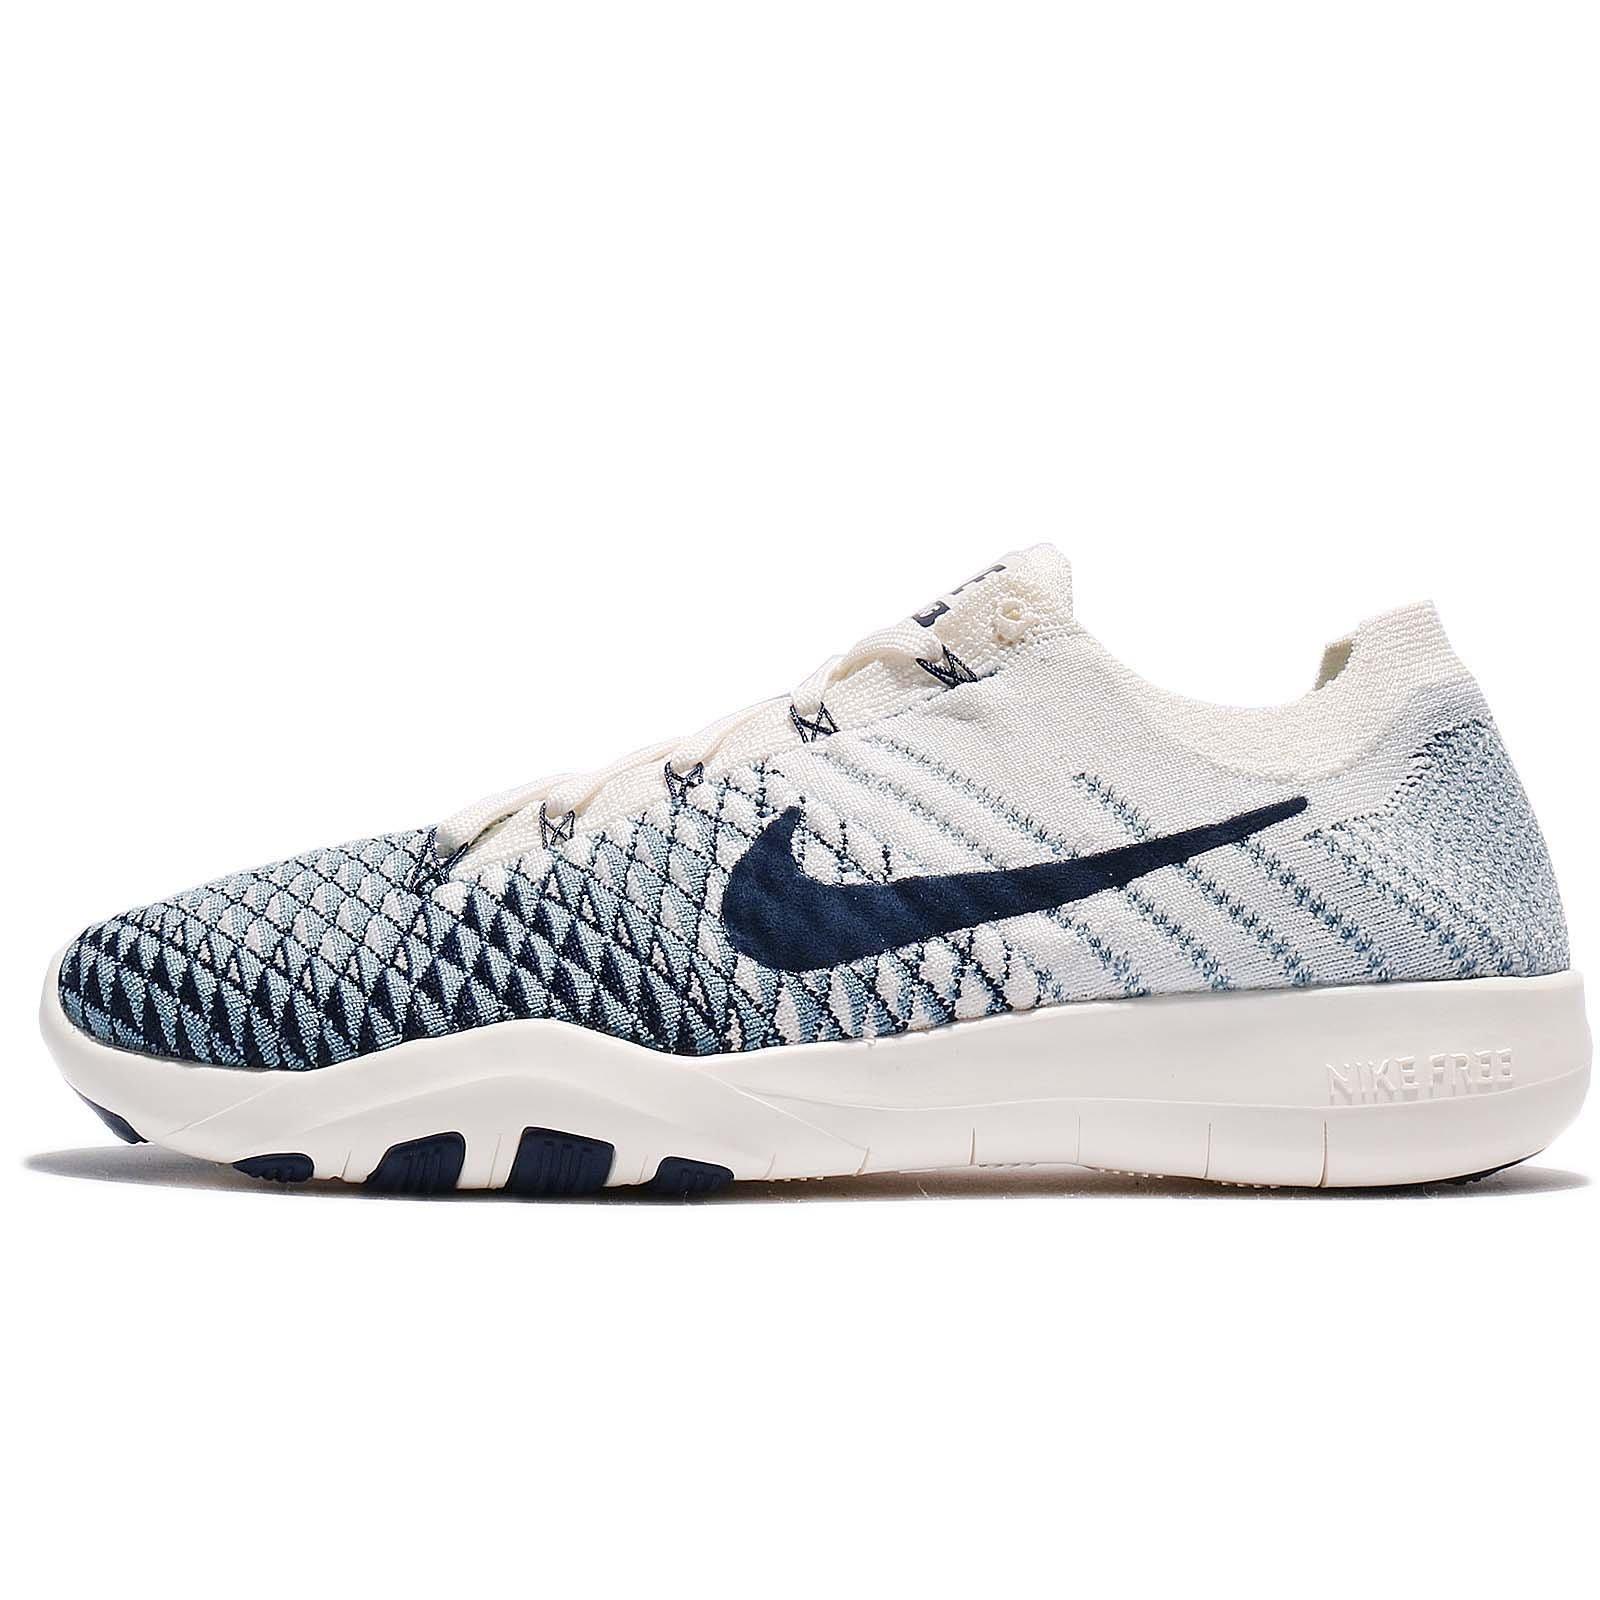 8e7dfe86d7f Galleon - NIKE Free TR Flyknit 2 Womens Running Shoes (8 B(M) US ...